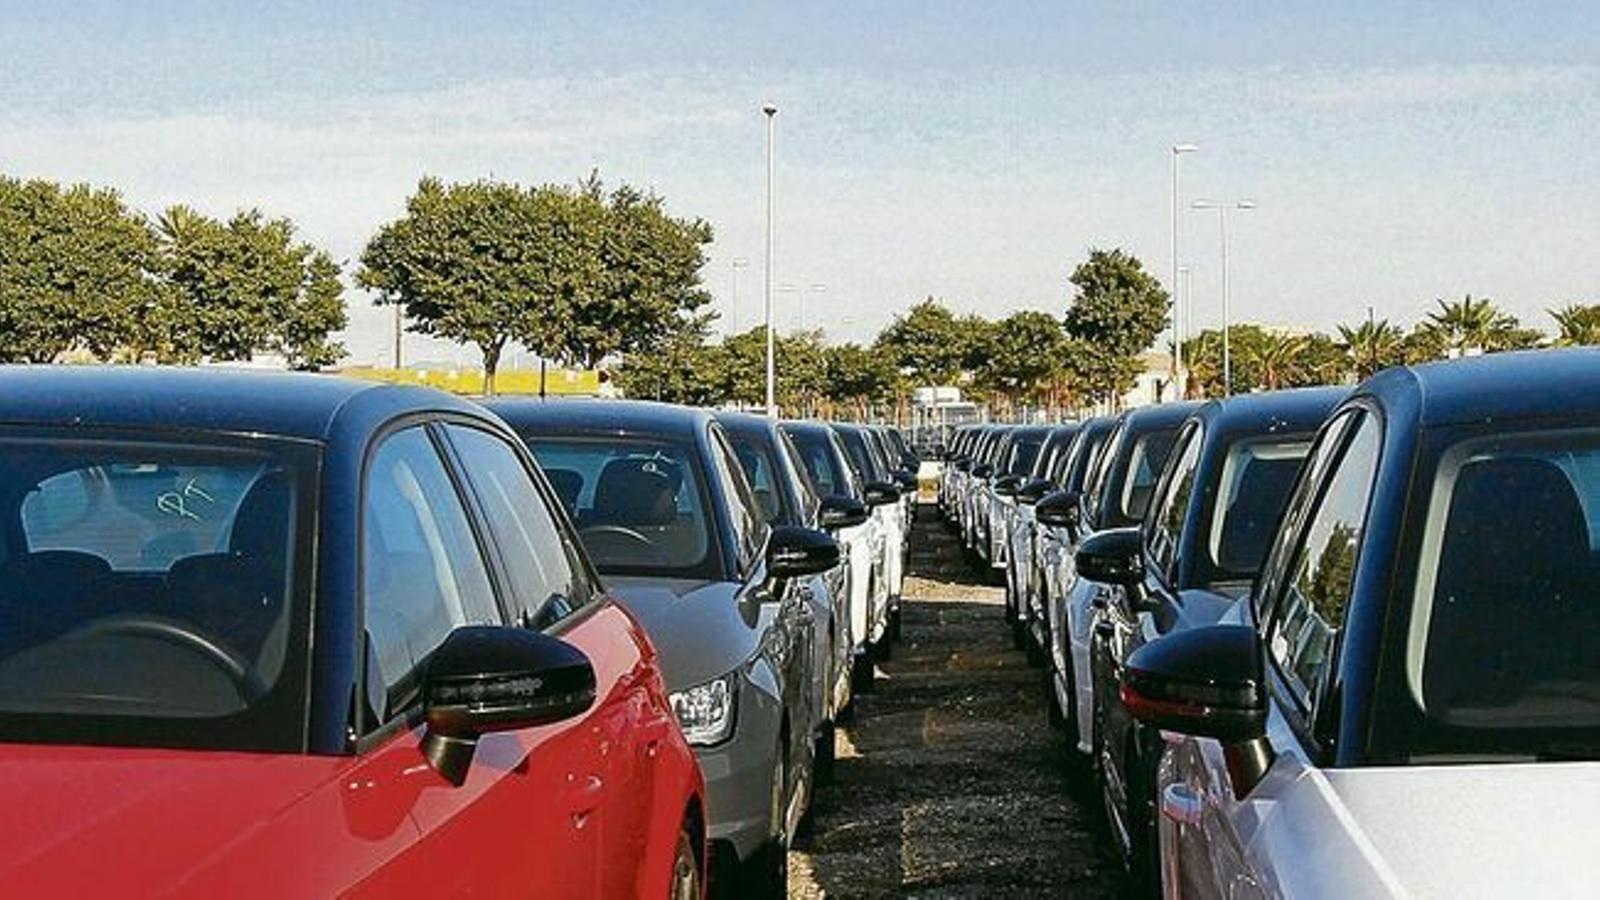 Cauen en picat les vendes de vehicles dièsel a les Illes